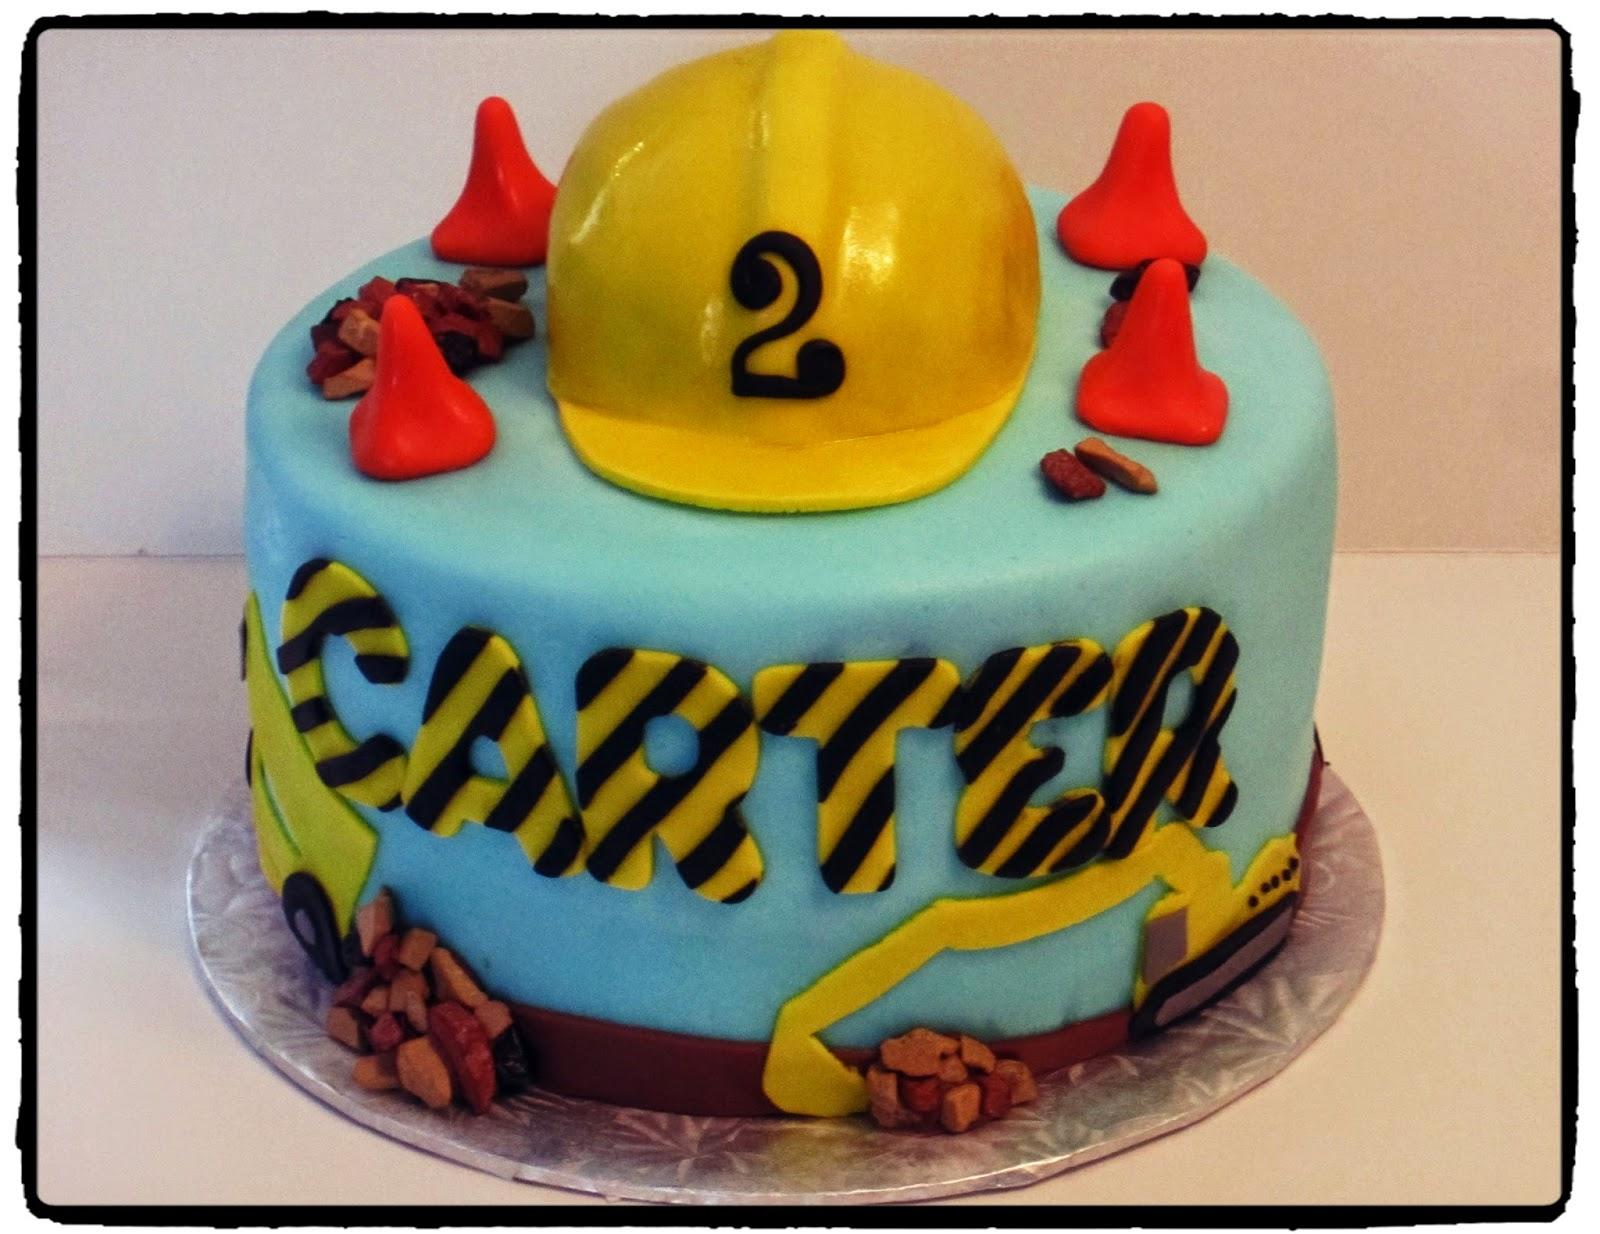 happy birthday karen cake images